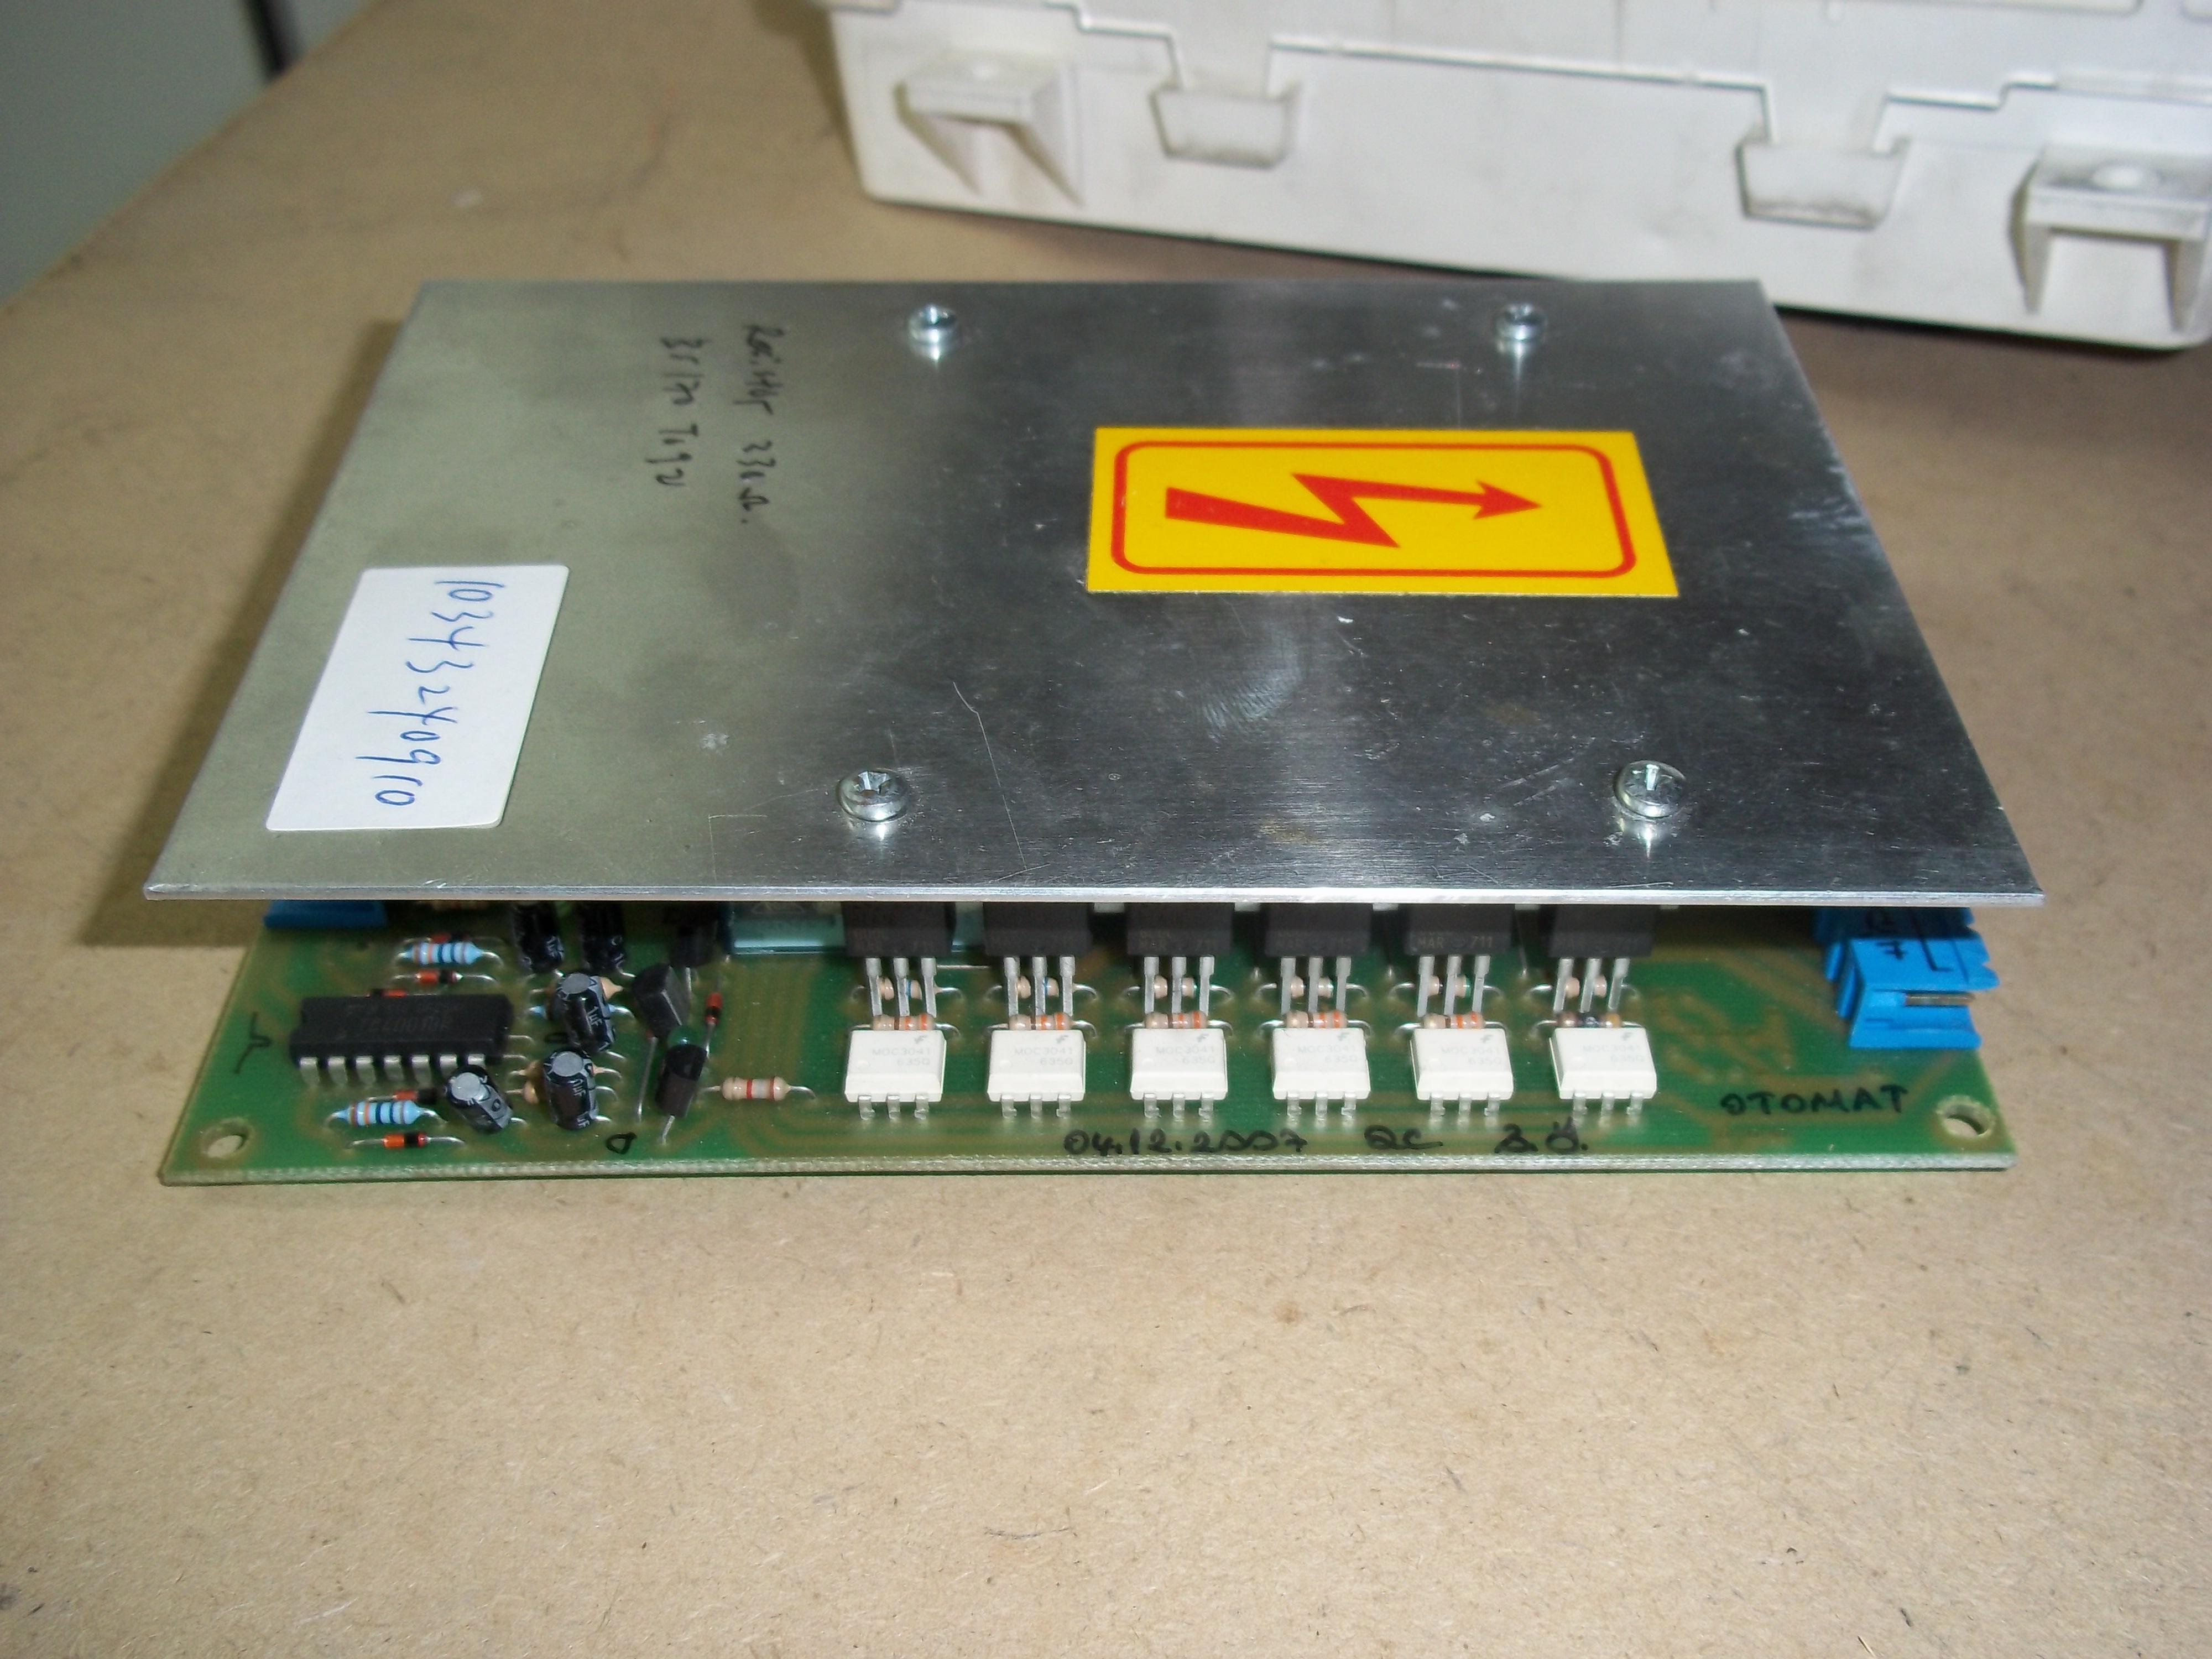 Repair TMOC-100CARD OTOMAT TRIAC MODULE OUTPUT CARD in Malaysia, Singapore, Thailand, Indonesia